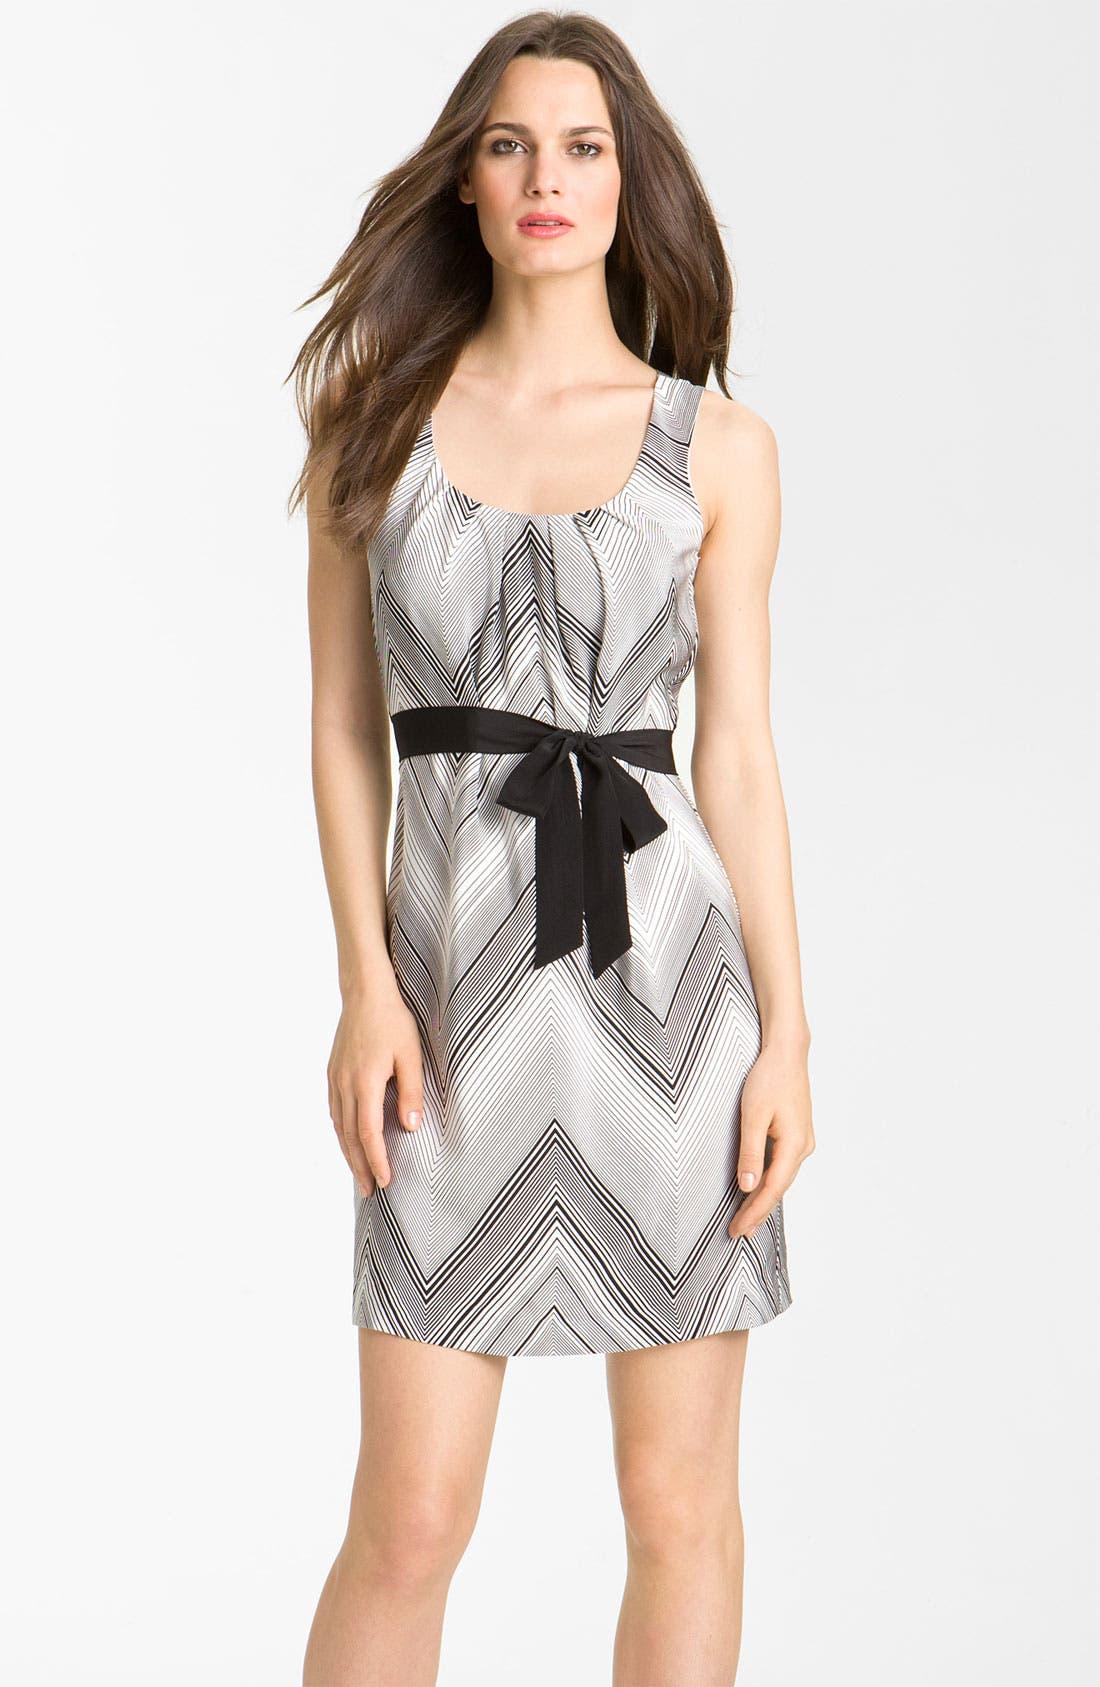 Alternate Image 1 Selected - Trina Turk 'Thistle' Sleeveless Dress